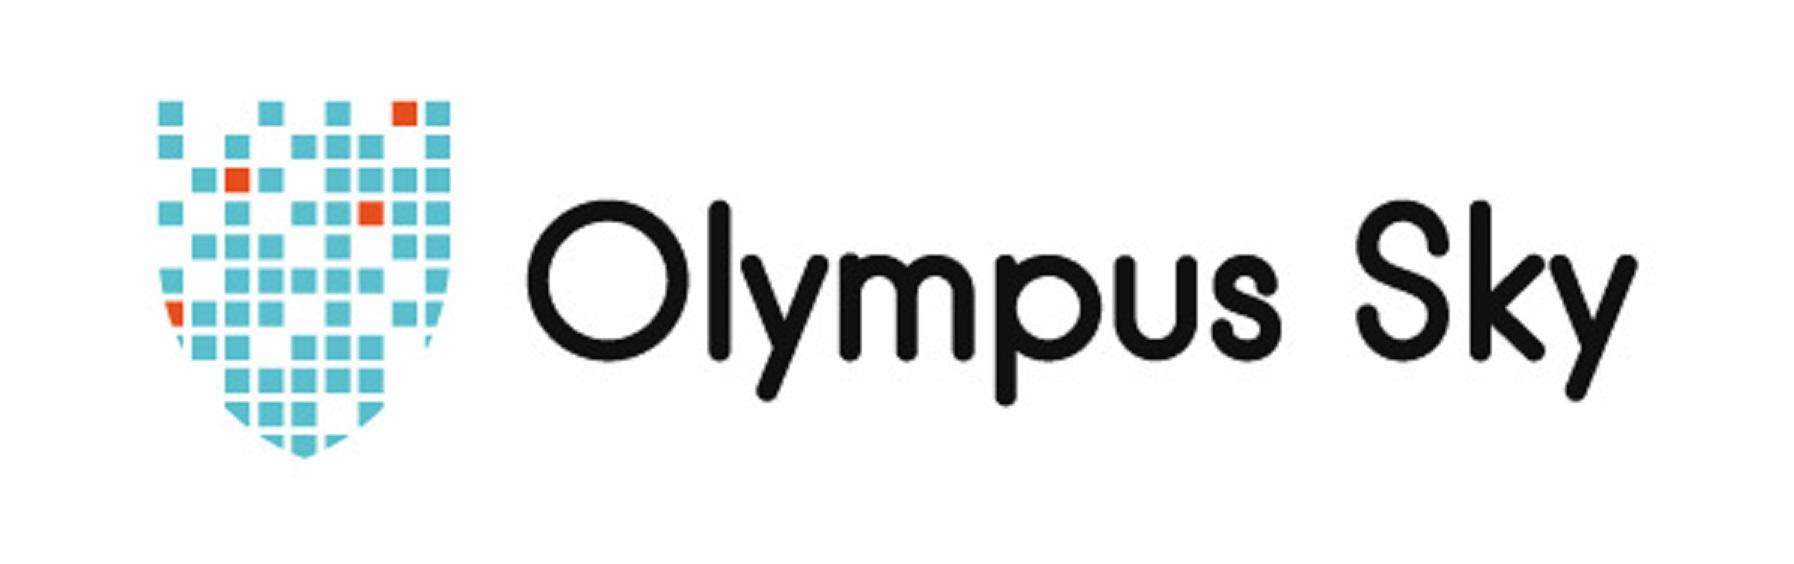 Olympus Sky